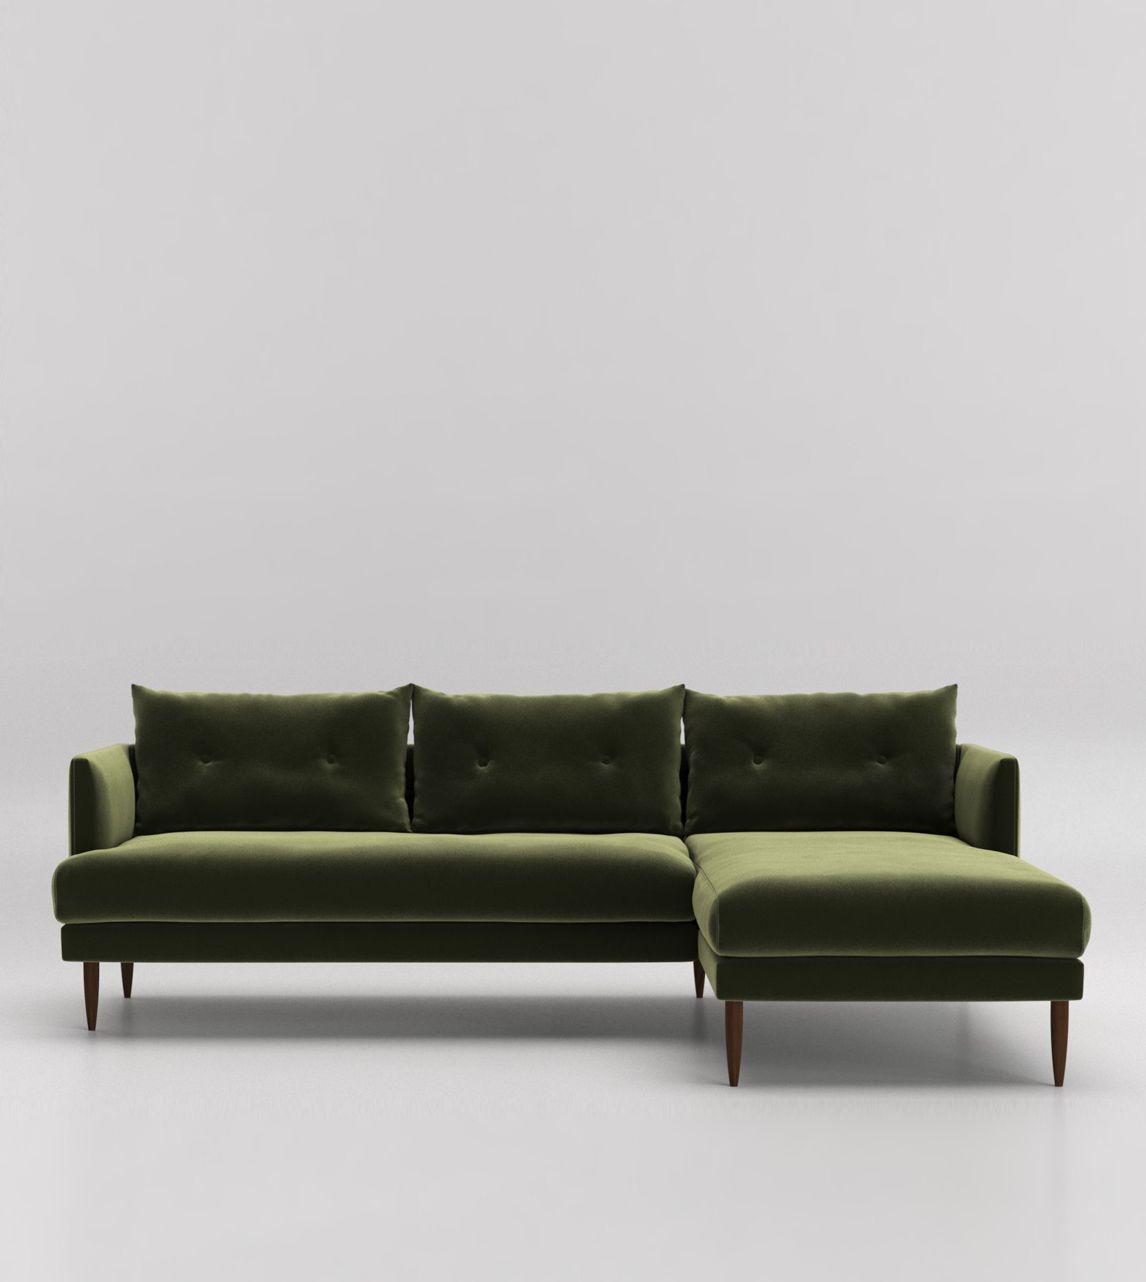 db659285d19 3 Seater Sofas